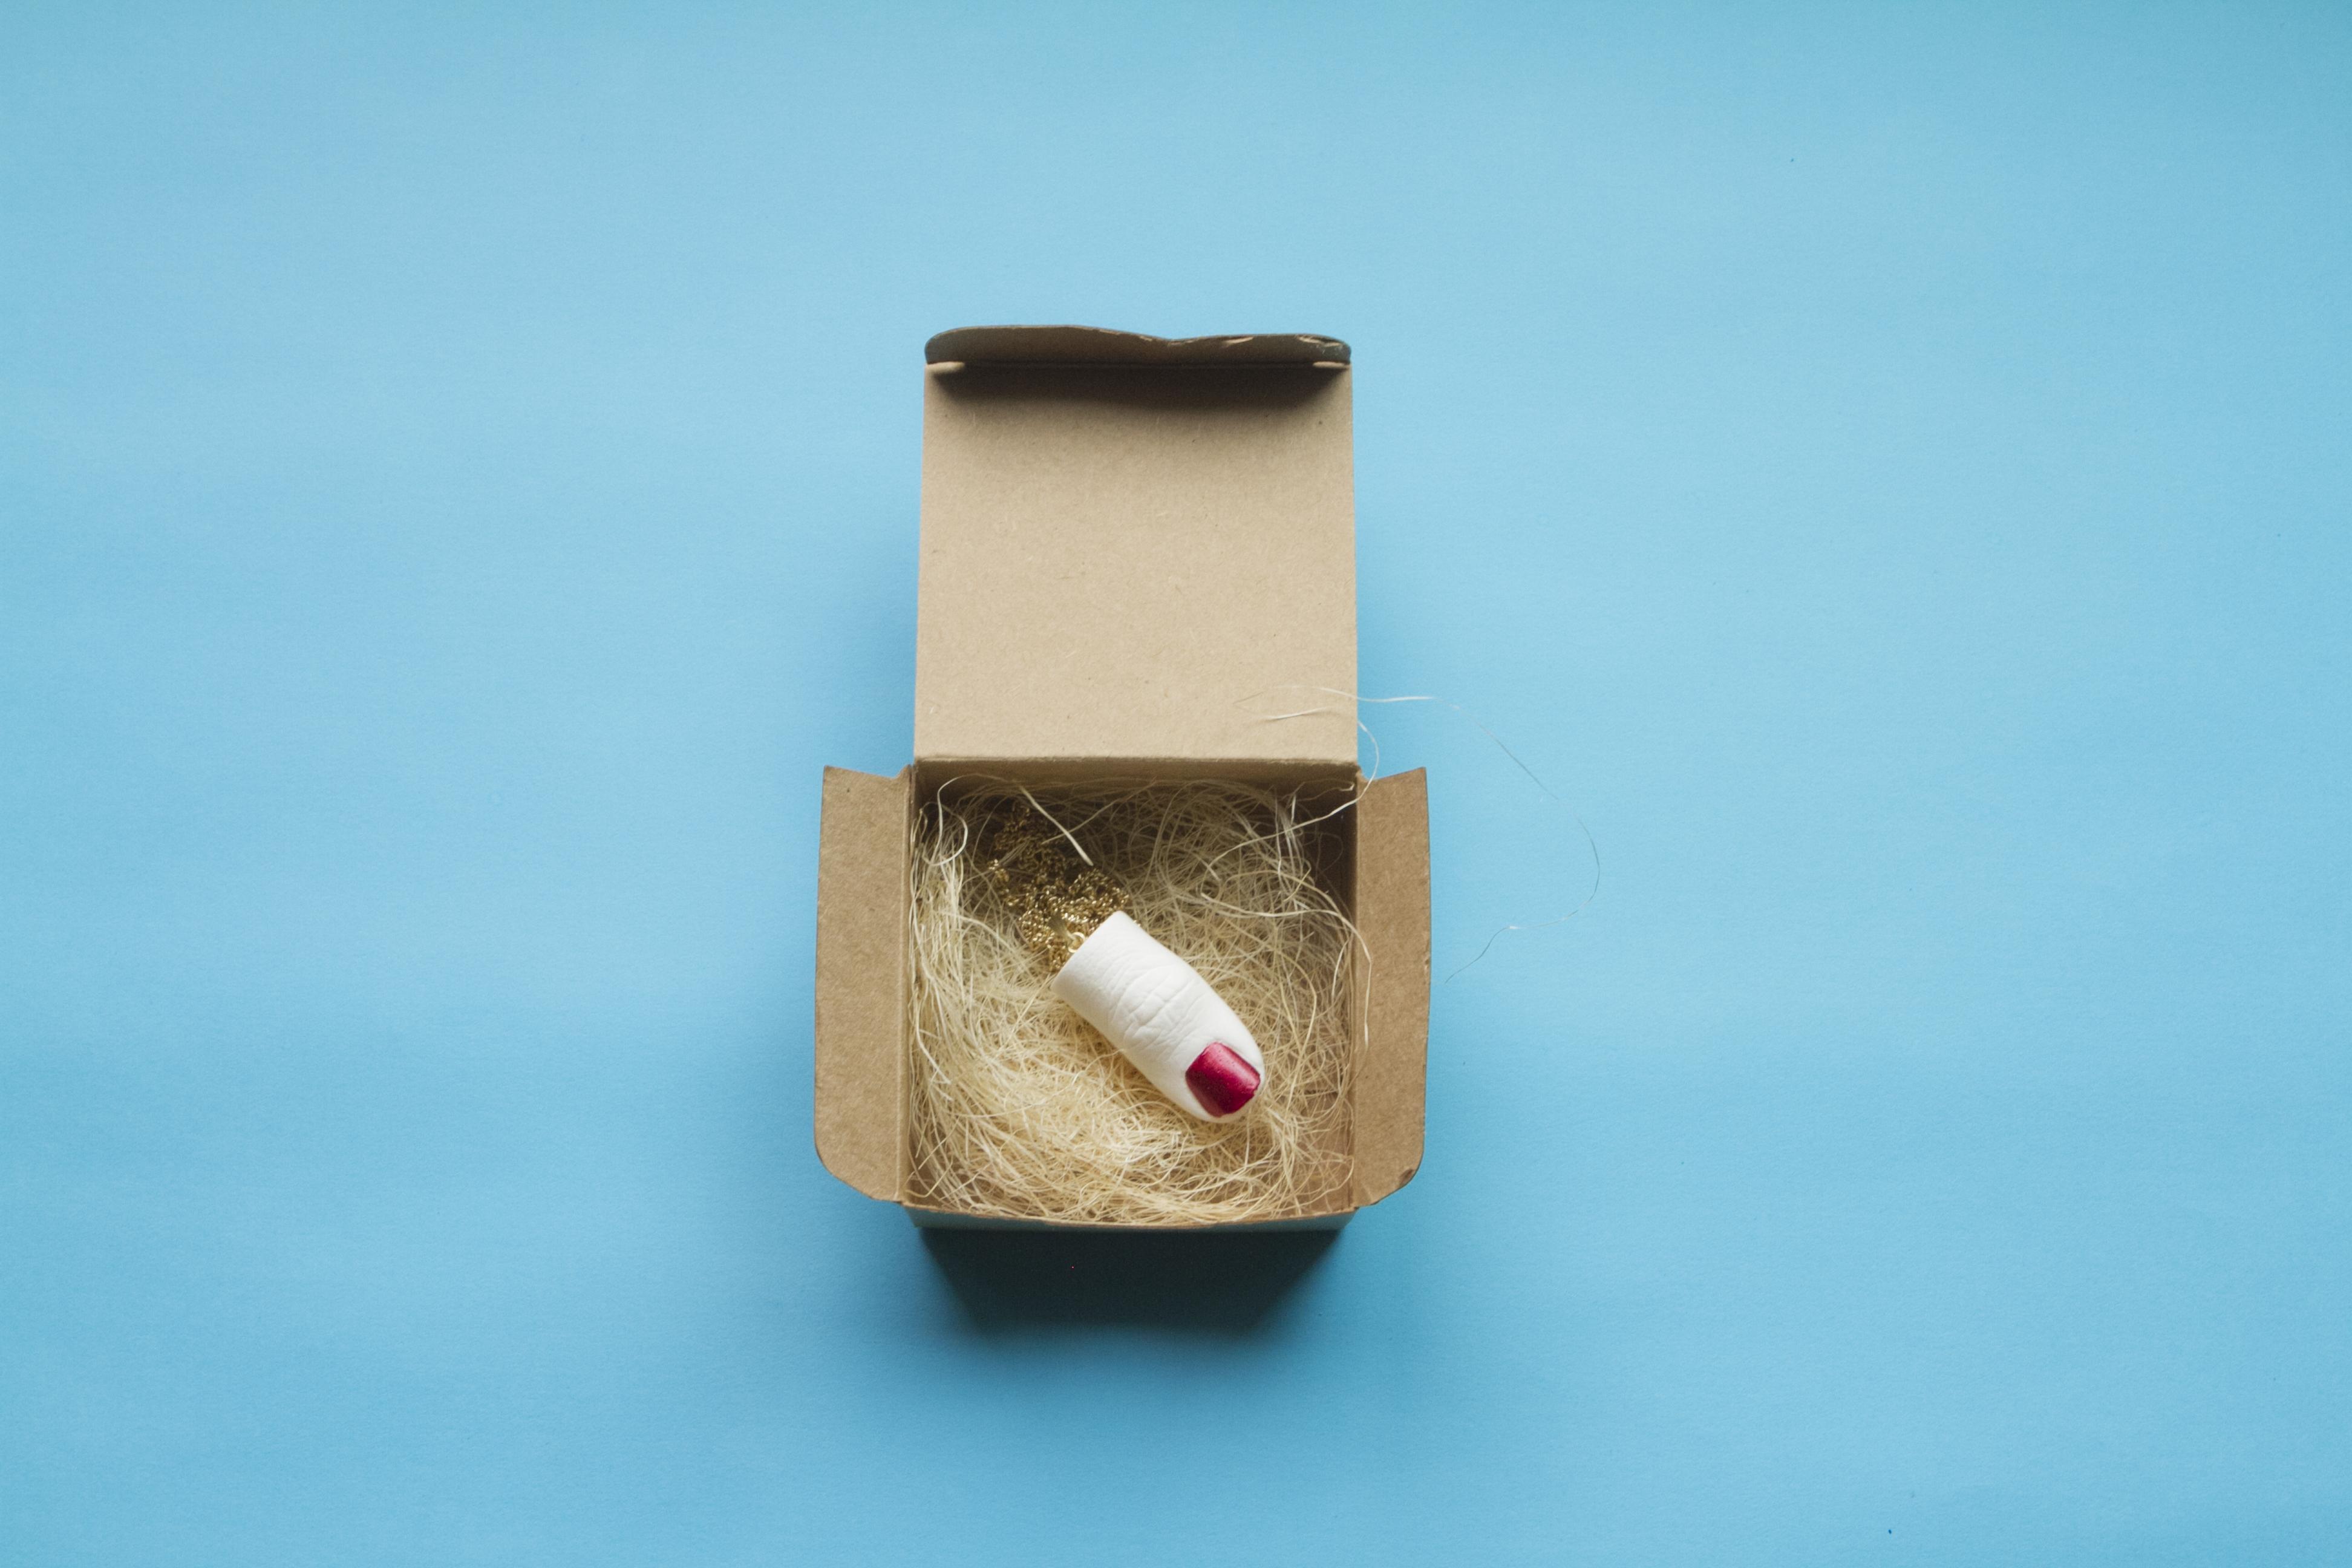 red-nailpolish-thumb-necklace-in-a-box